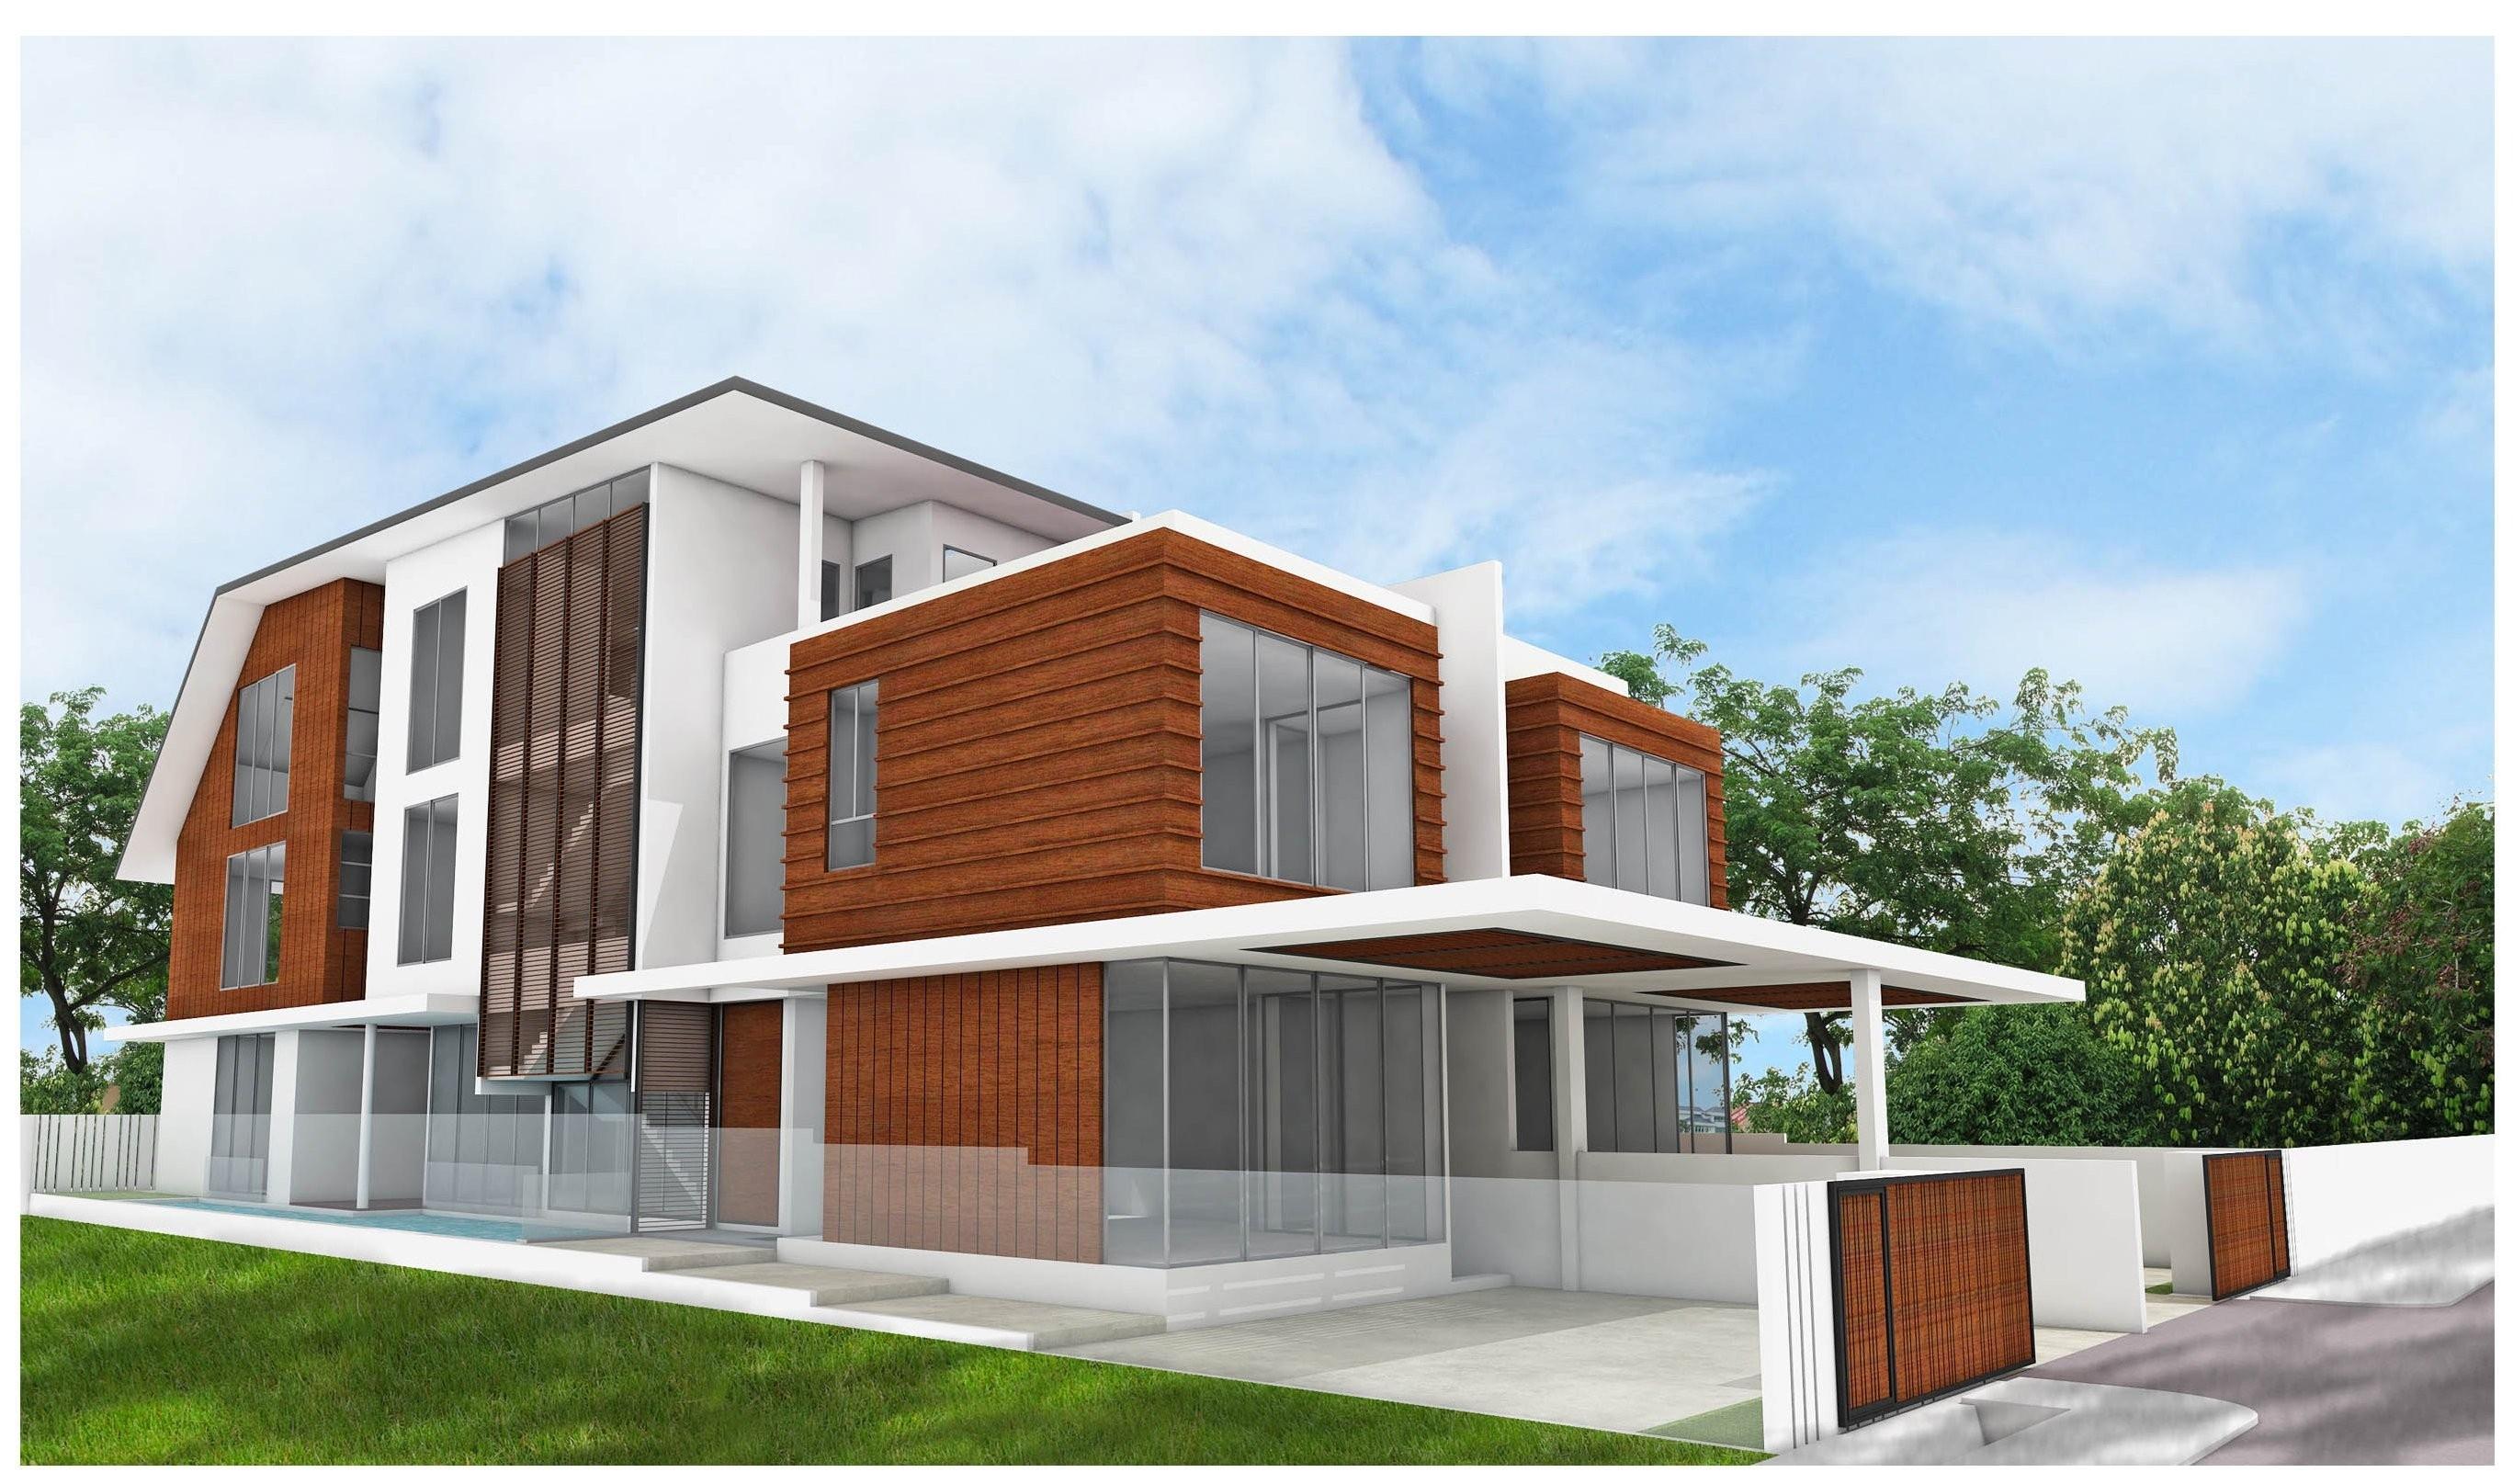 Car Porch Roof Designs Porches Ideas